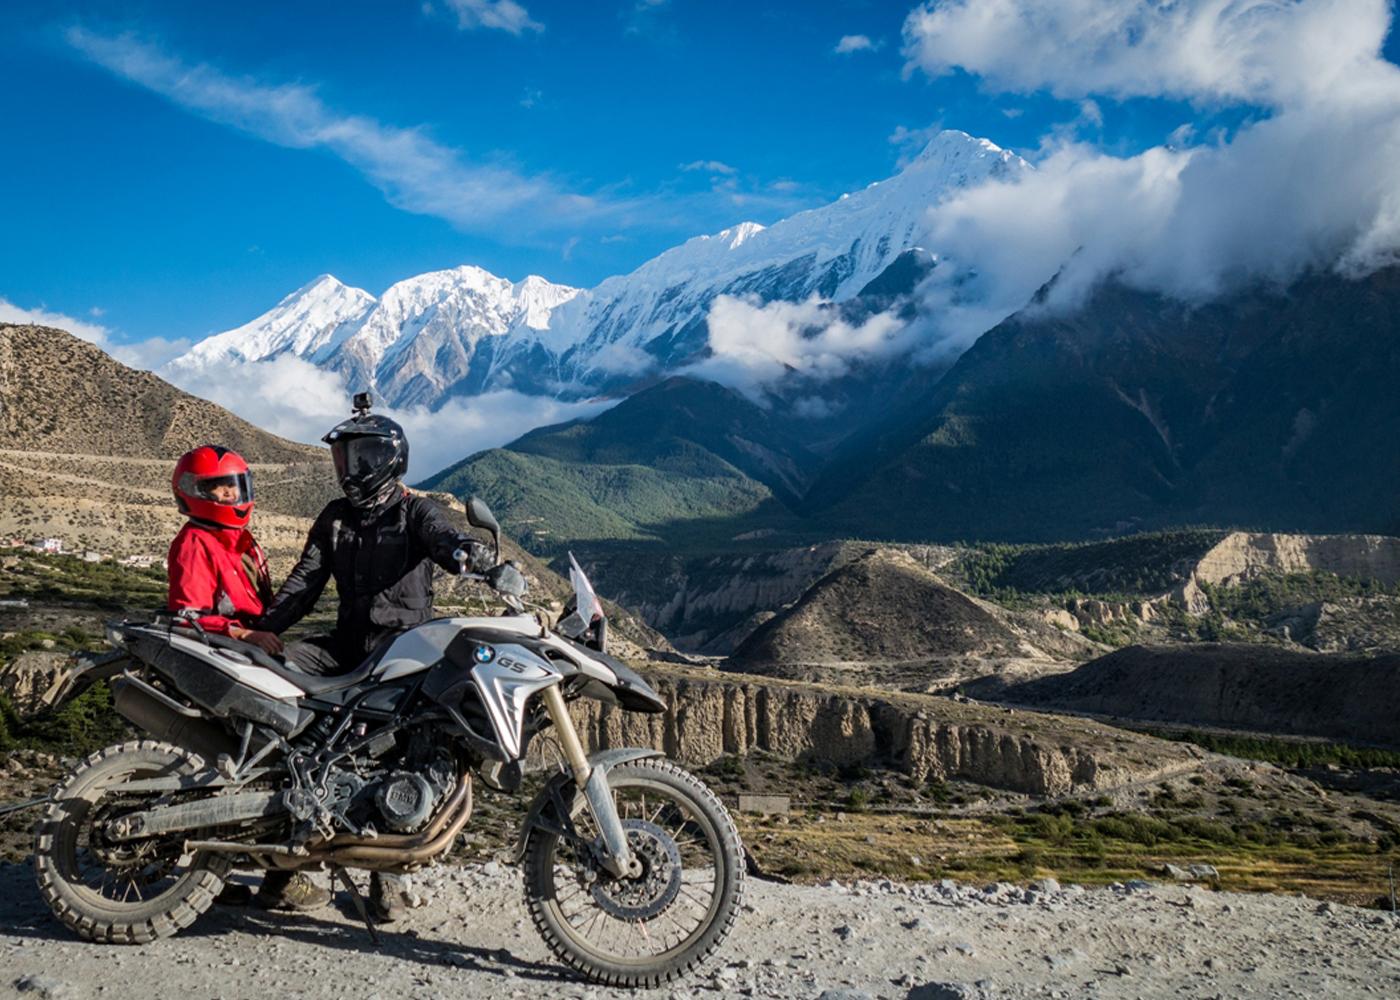 Explore Muktinath, Lower Mustang - BMW Motorcycle